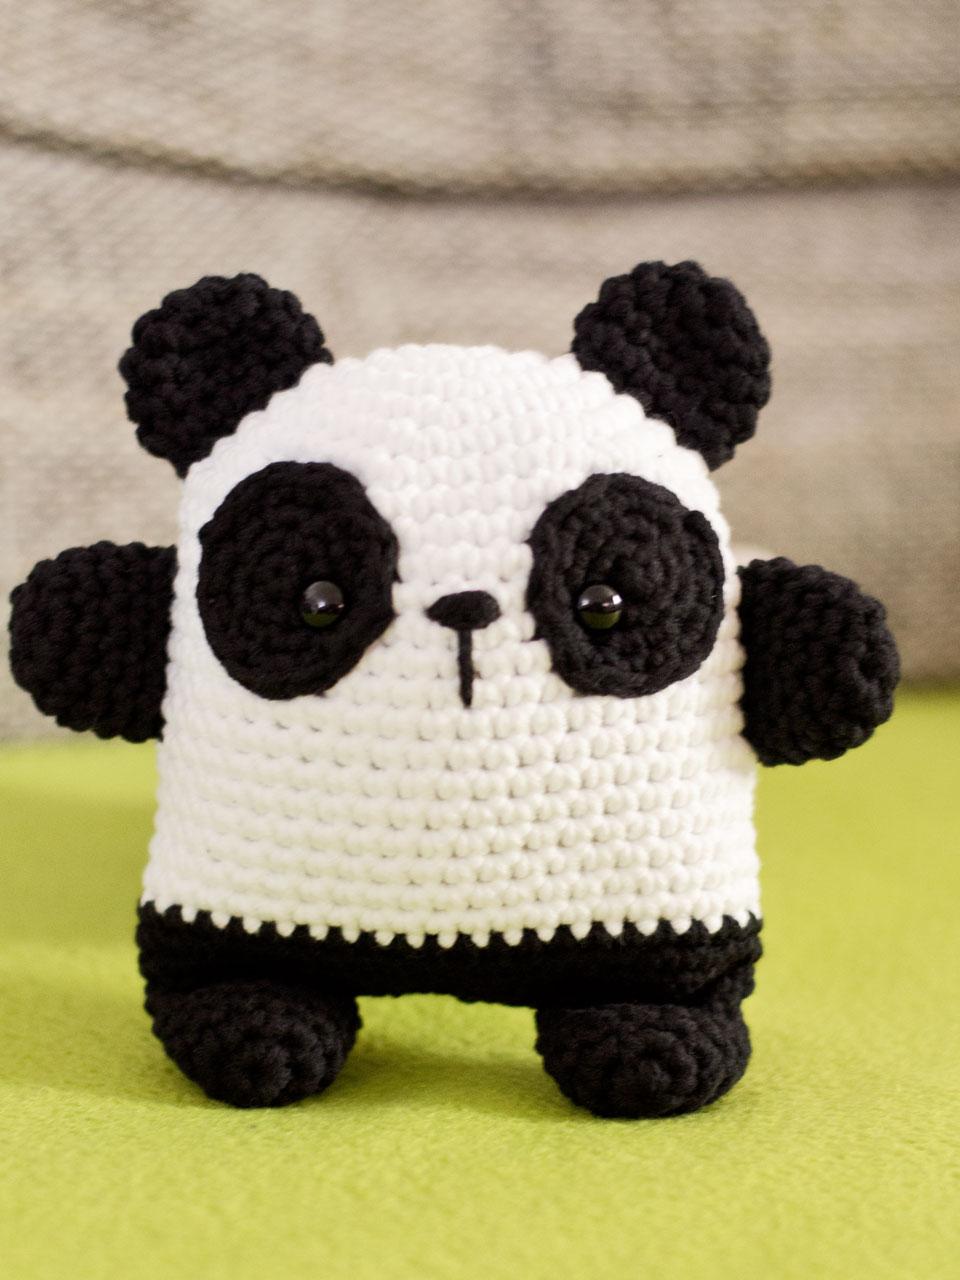 Minion 2 Eyes, Handmade Crochet Amigurumi, Stuffed Toy, Gift ... | 1280x960